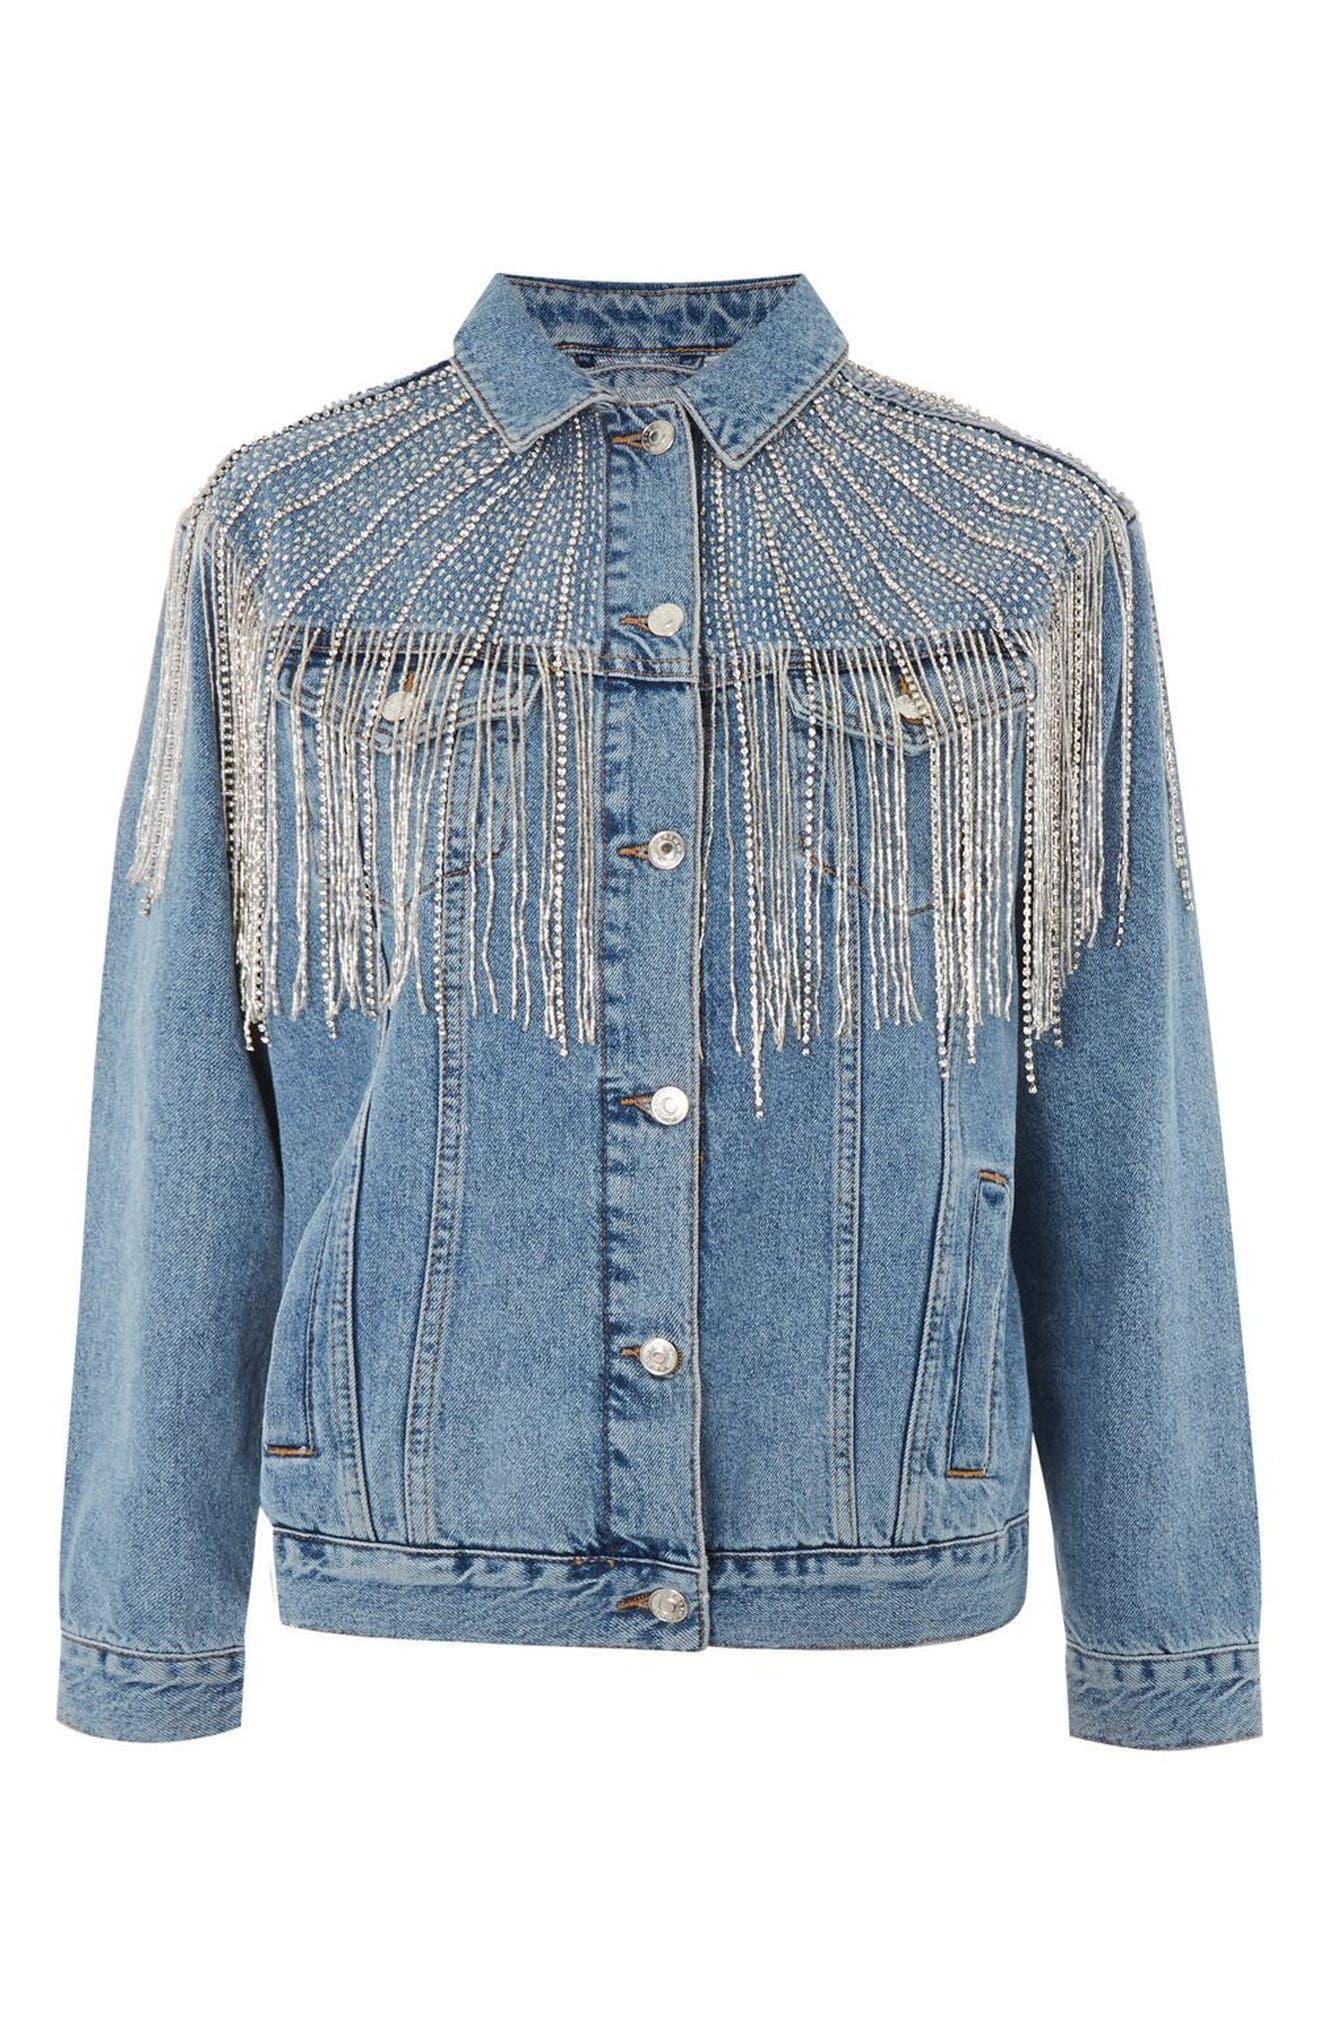 Dolly Sequin Fringe Denim Jacket,                             Alternate thumbnail 4, color,                             Mid Denim